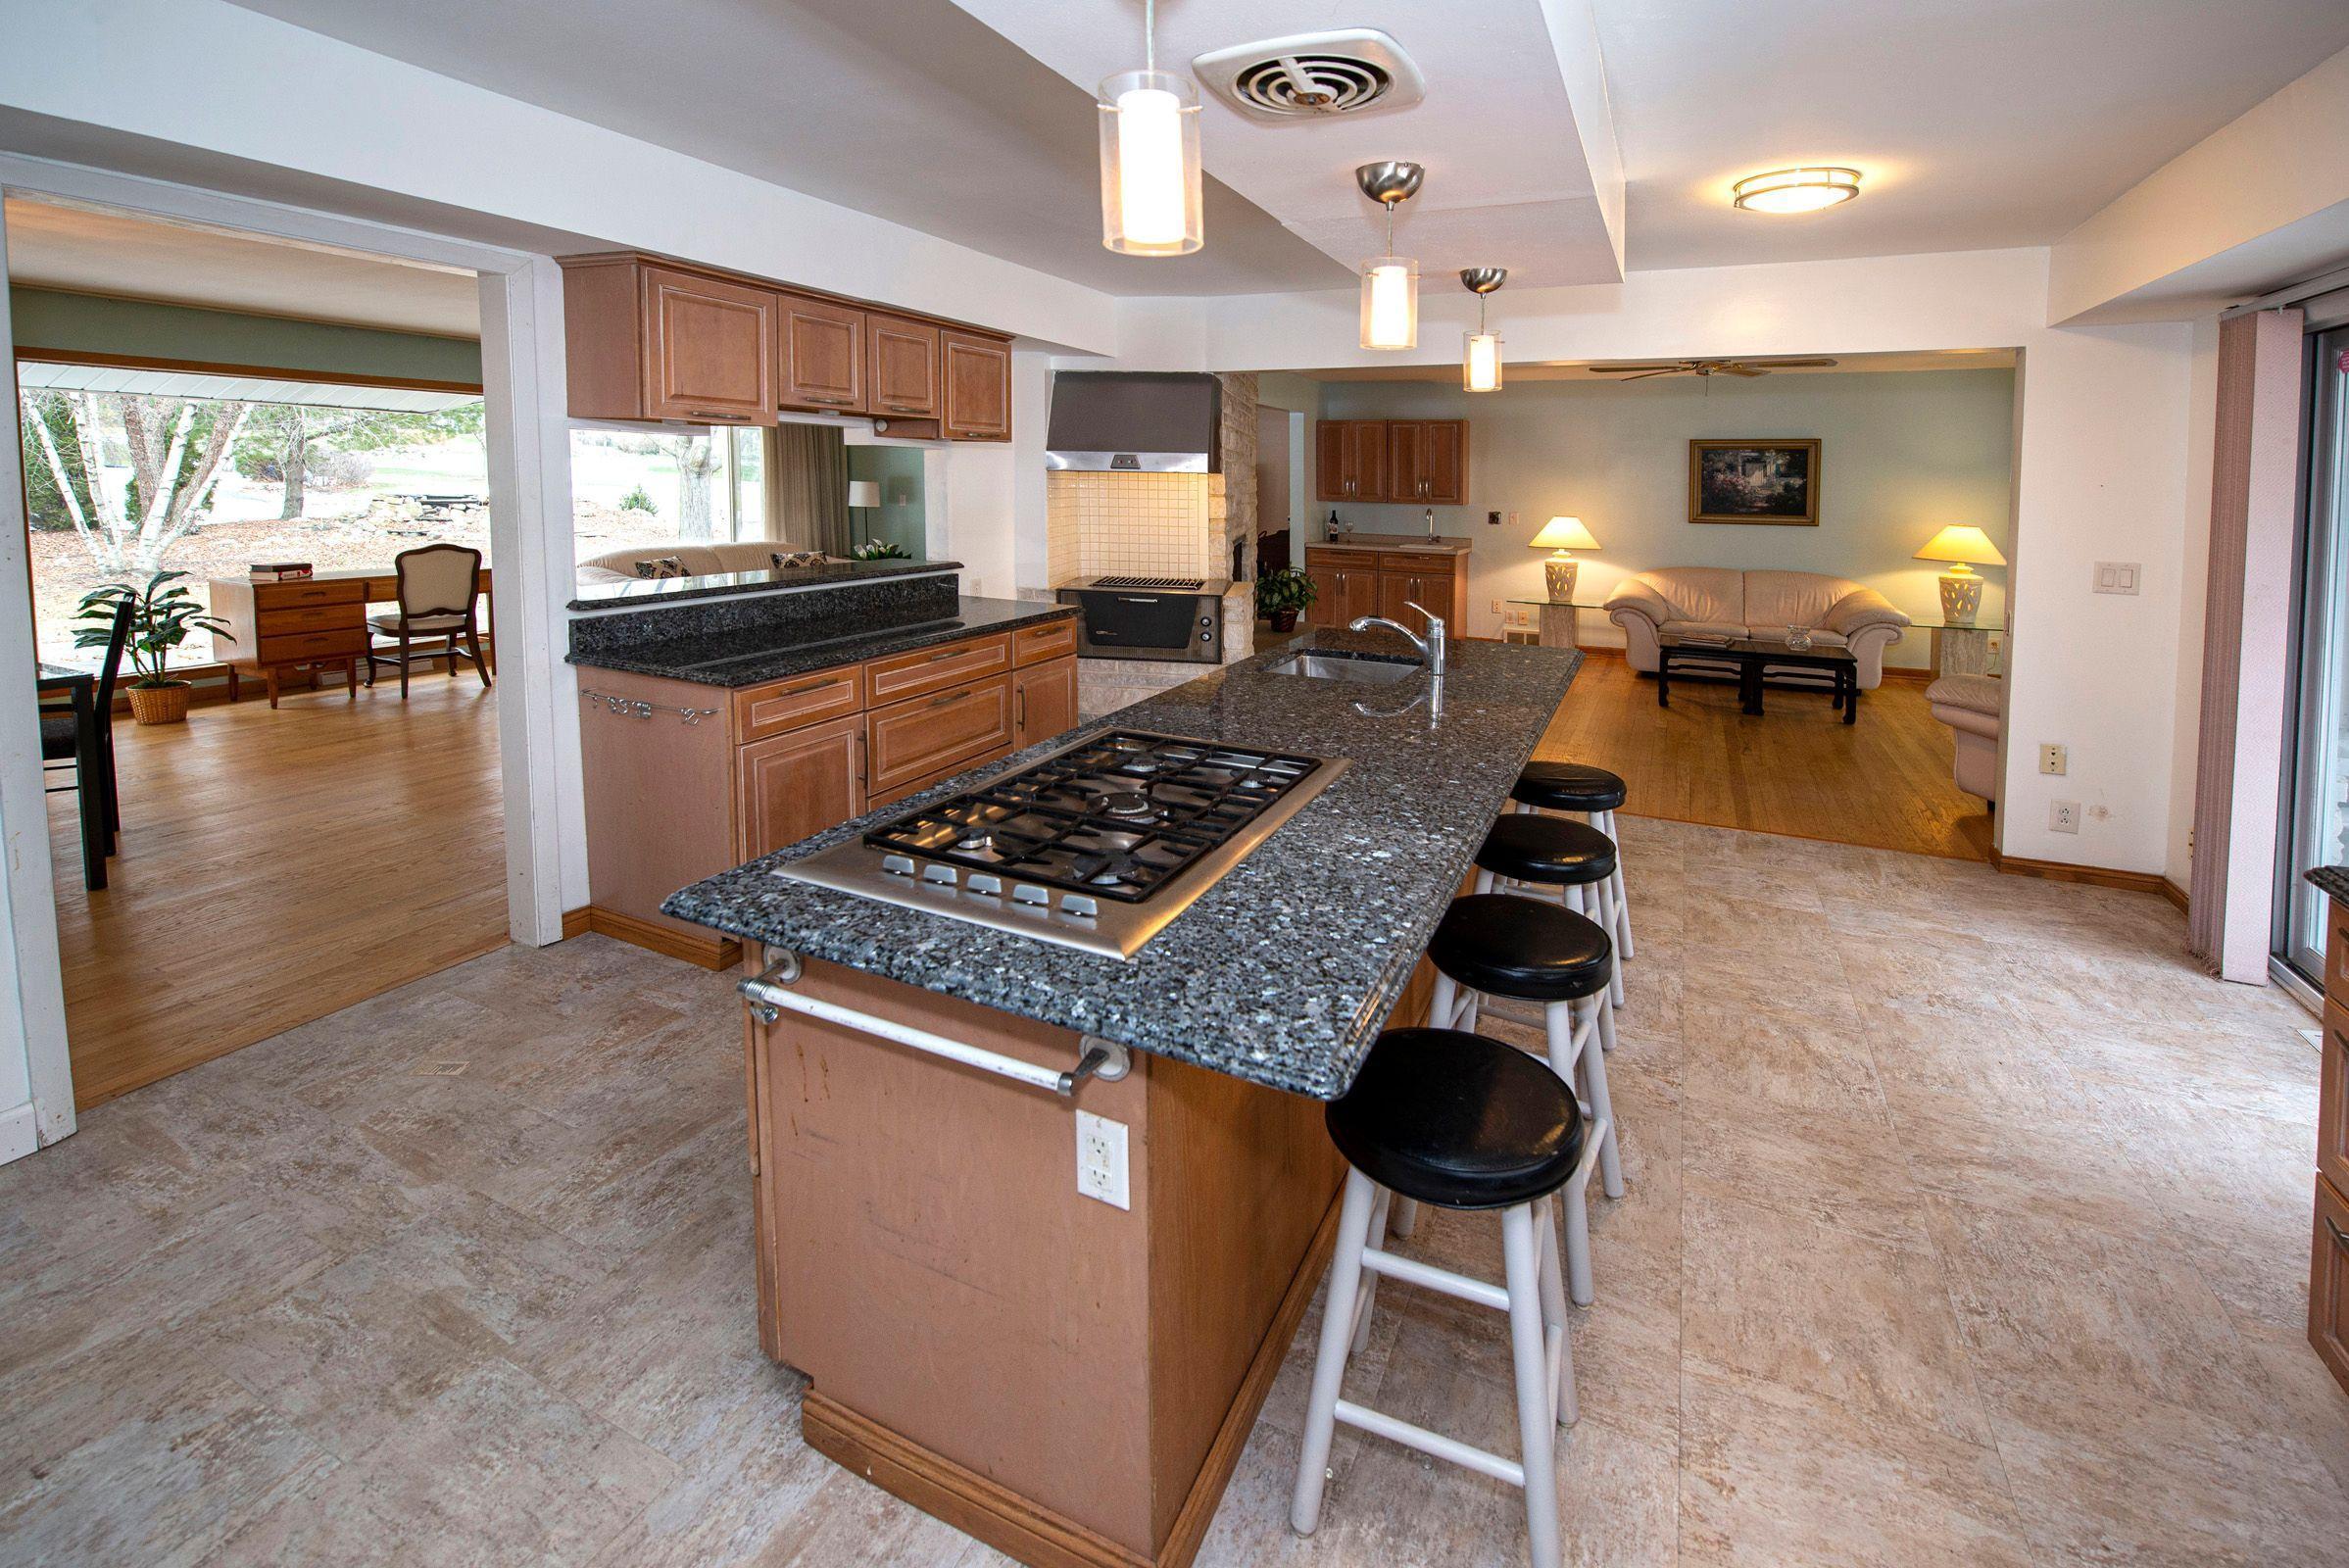 13505 Lannie Ct., Elm Grove, Wisconsin 53122, 4 Bedrooms Bedrooms, 12 Rooms Rooms,3 BathroomsBathrooms,Single-family,For Sale,Lannie Ct.,1721661